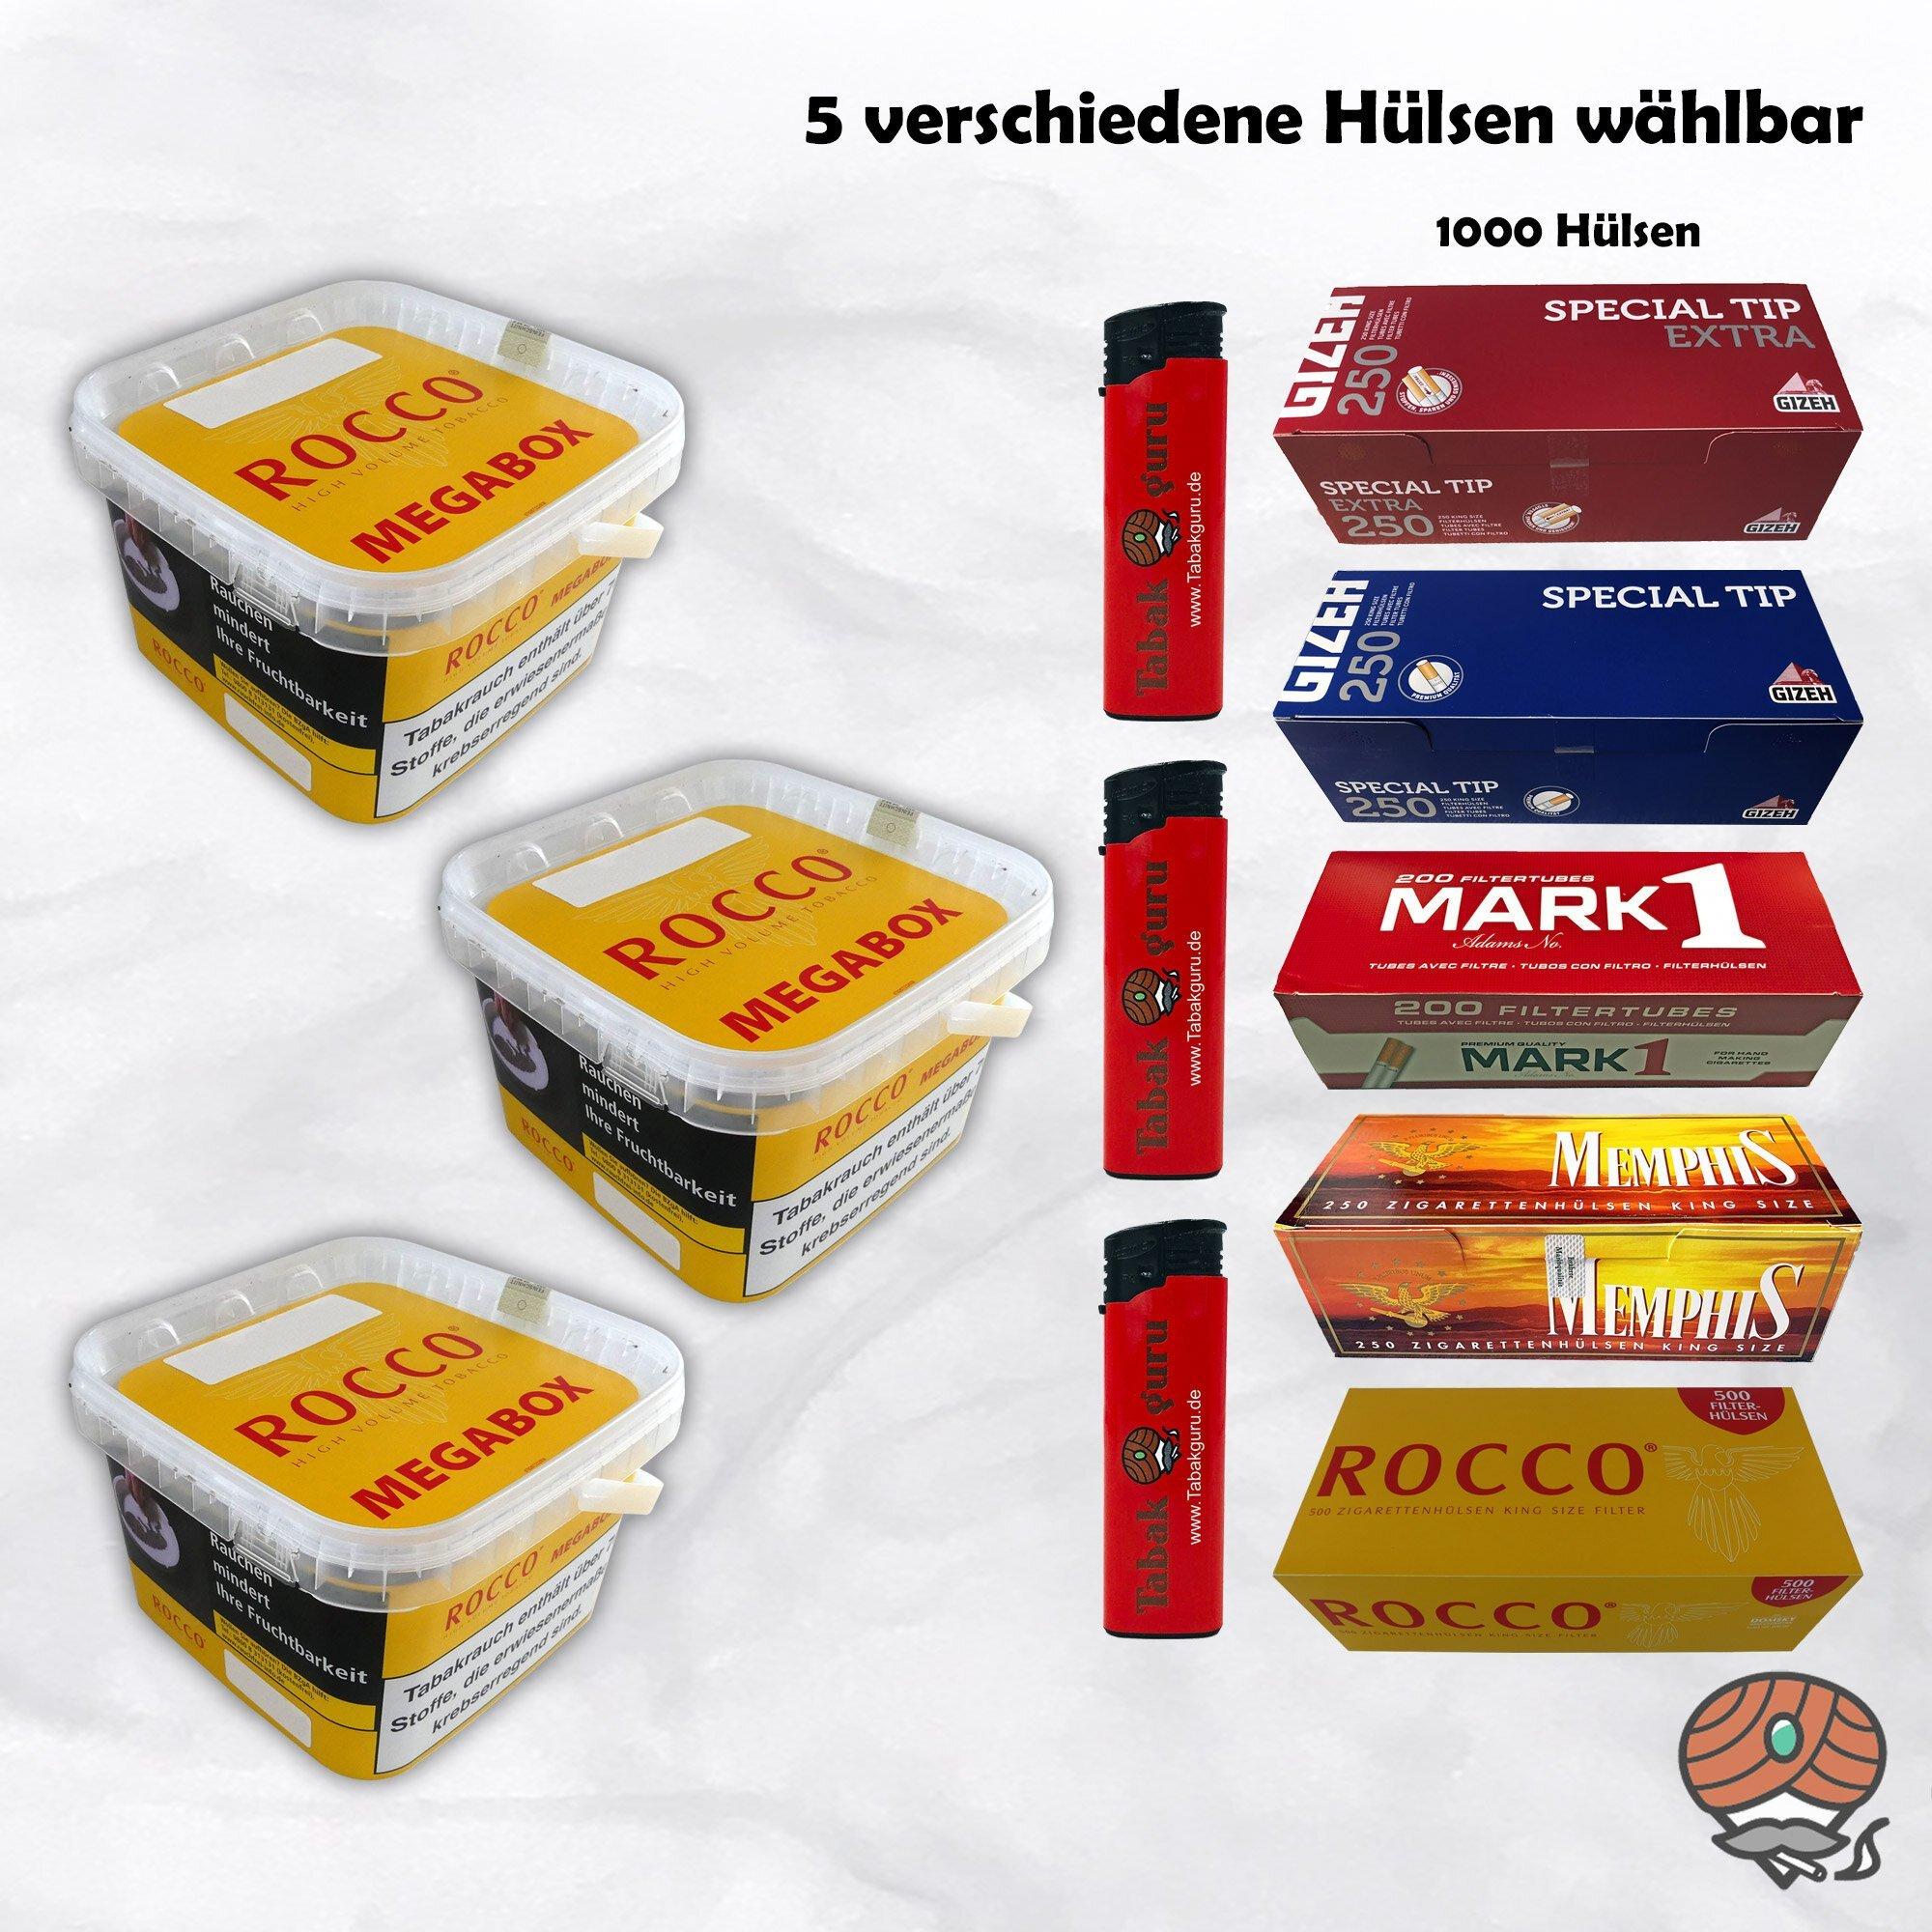 3 x ROCCO Volumentabak Gelb Megabox 210 g + 1.000 Hülsen wählbar - Angebot ohne Hülsen